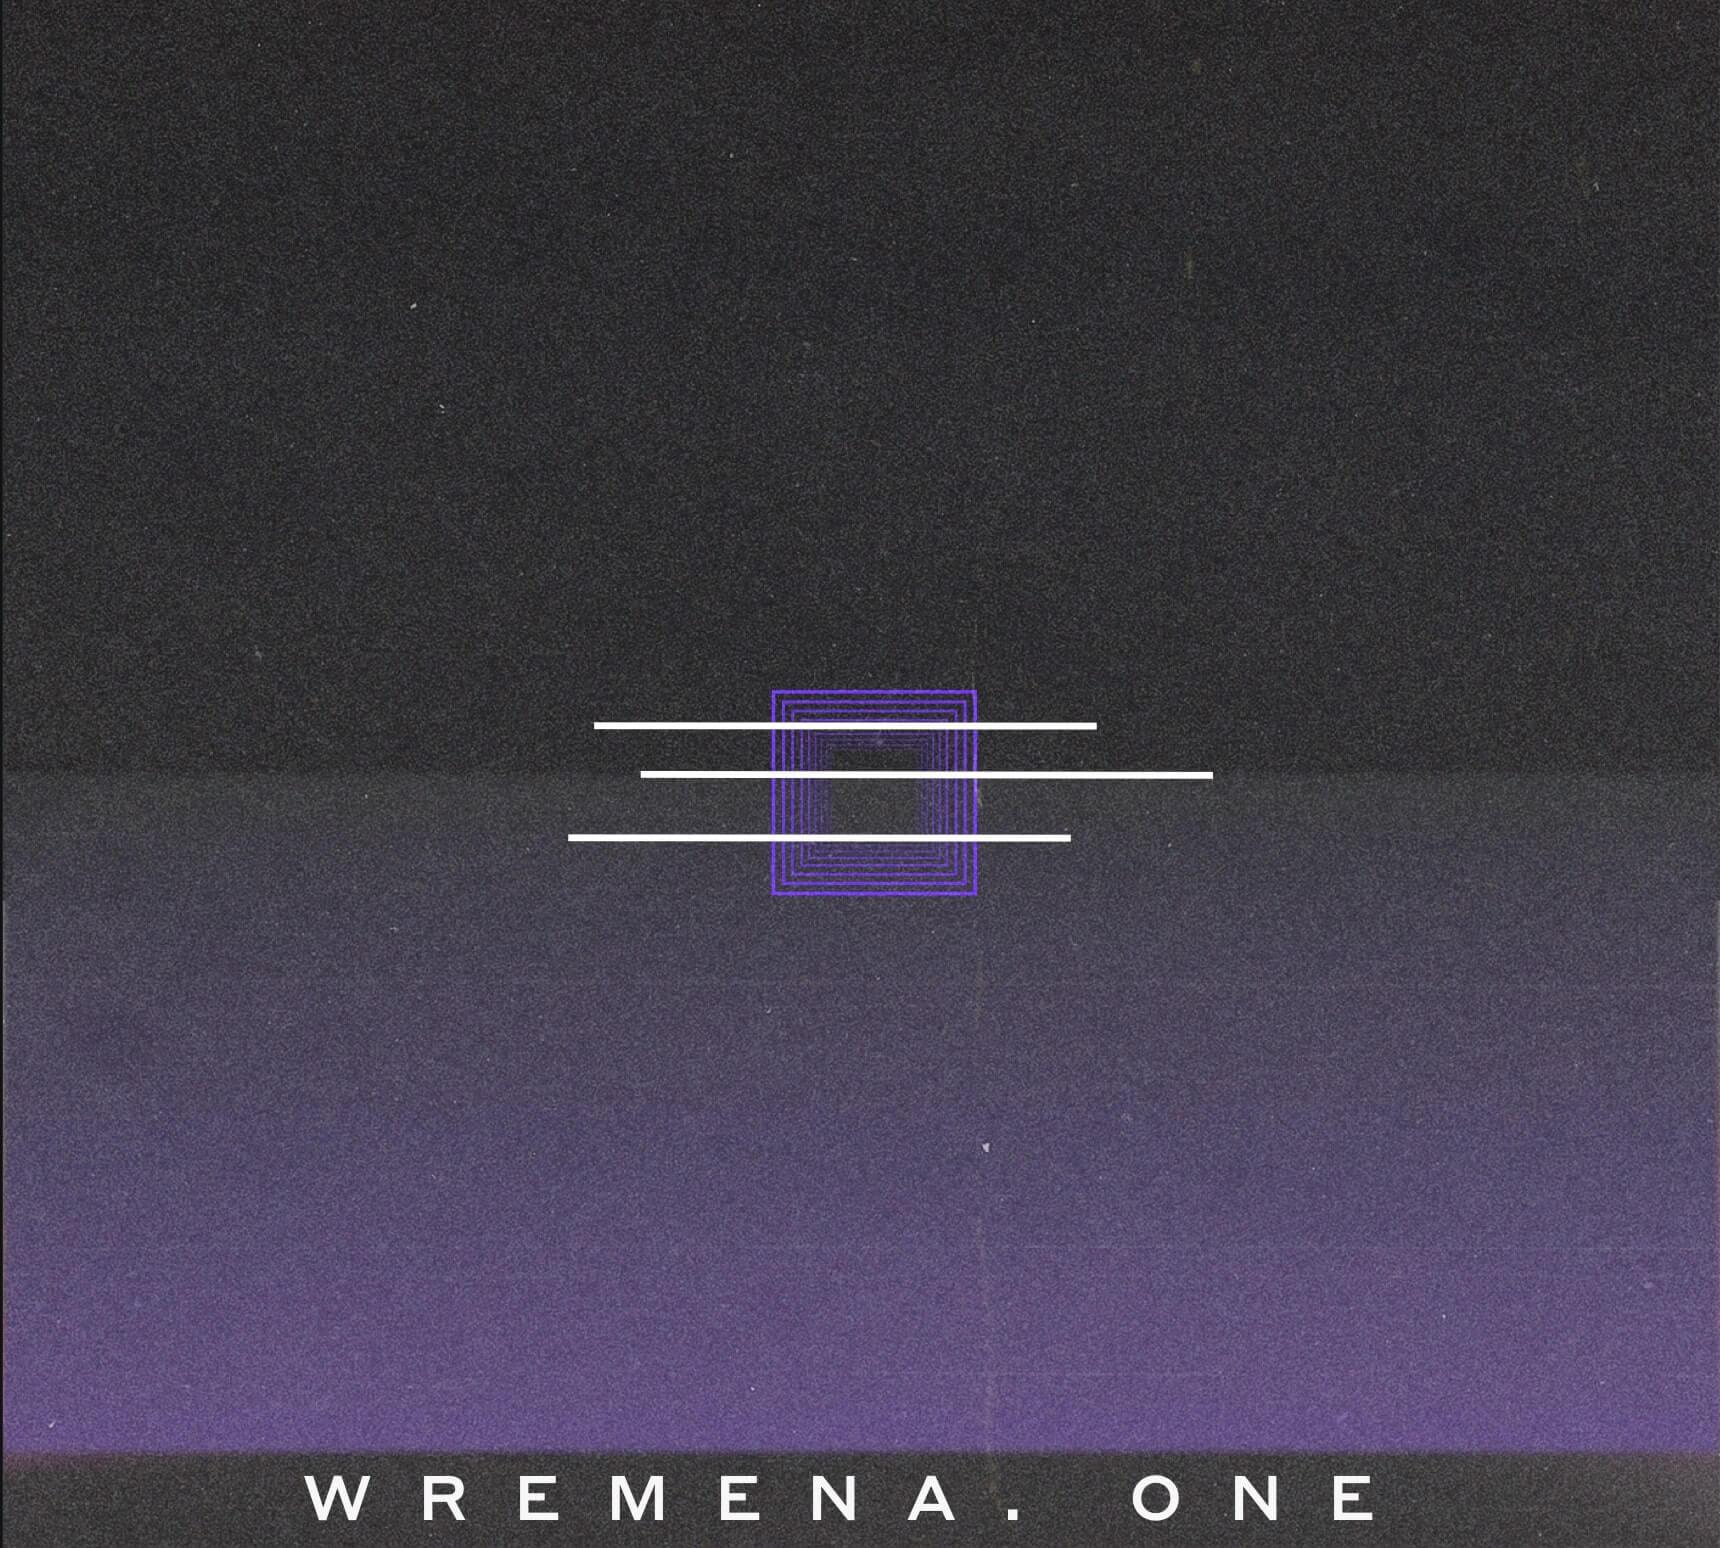 A cover art of a virtual guitar library 'WREMENA'